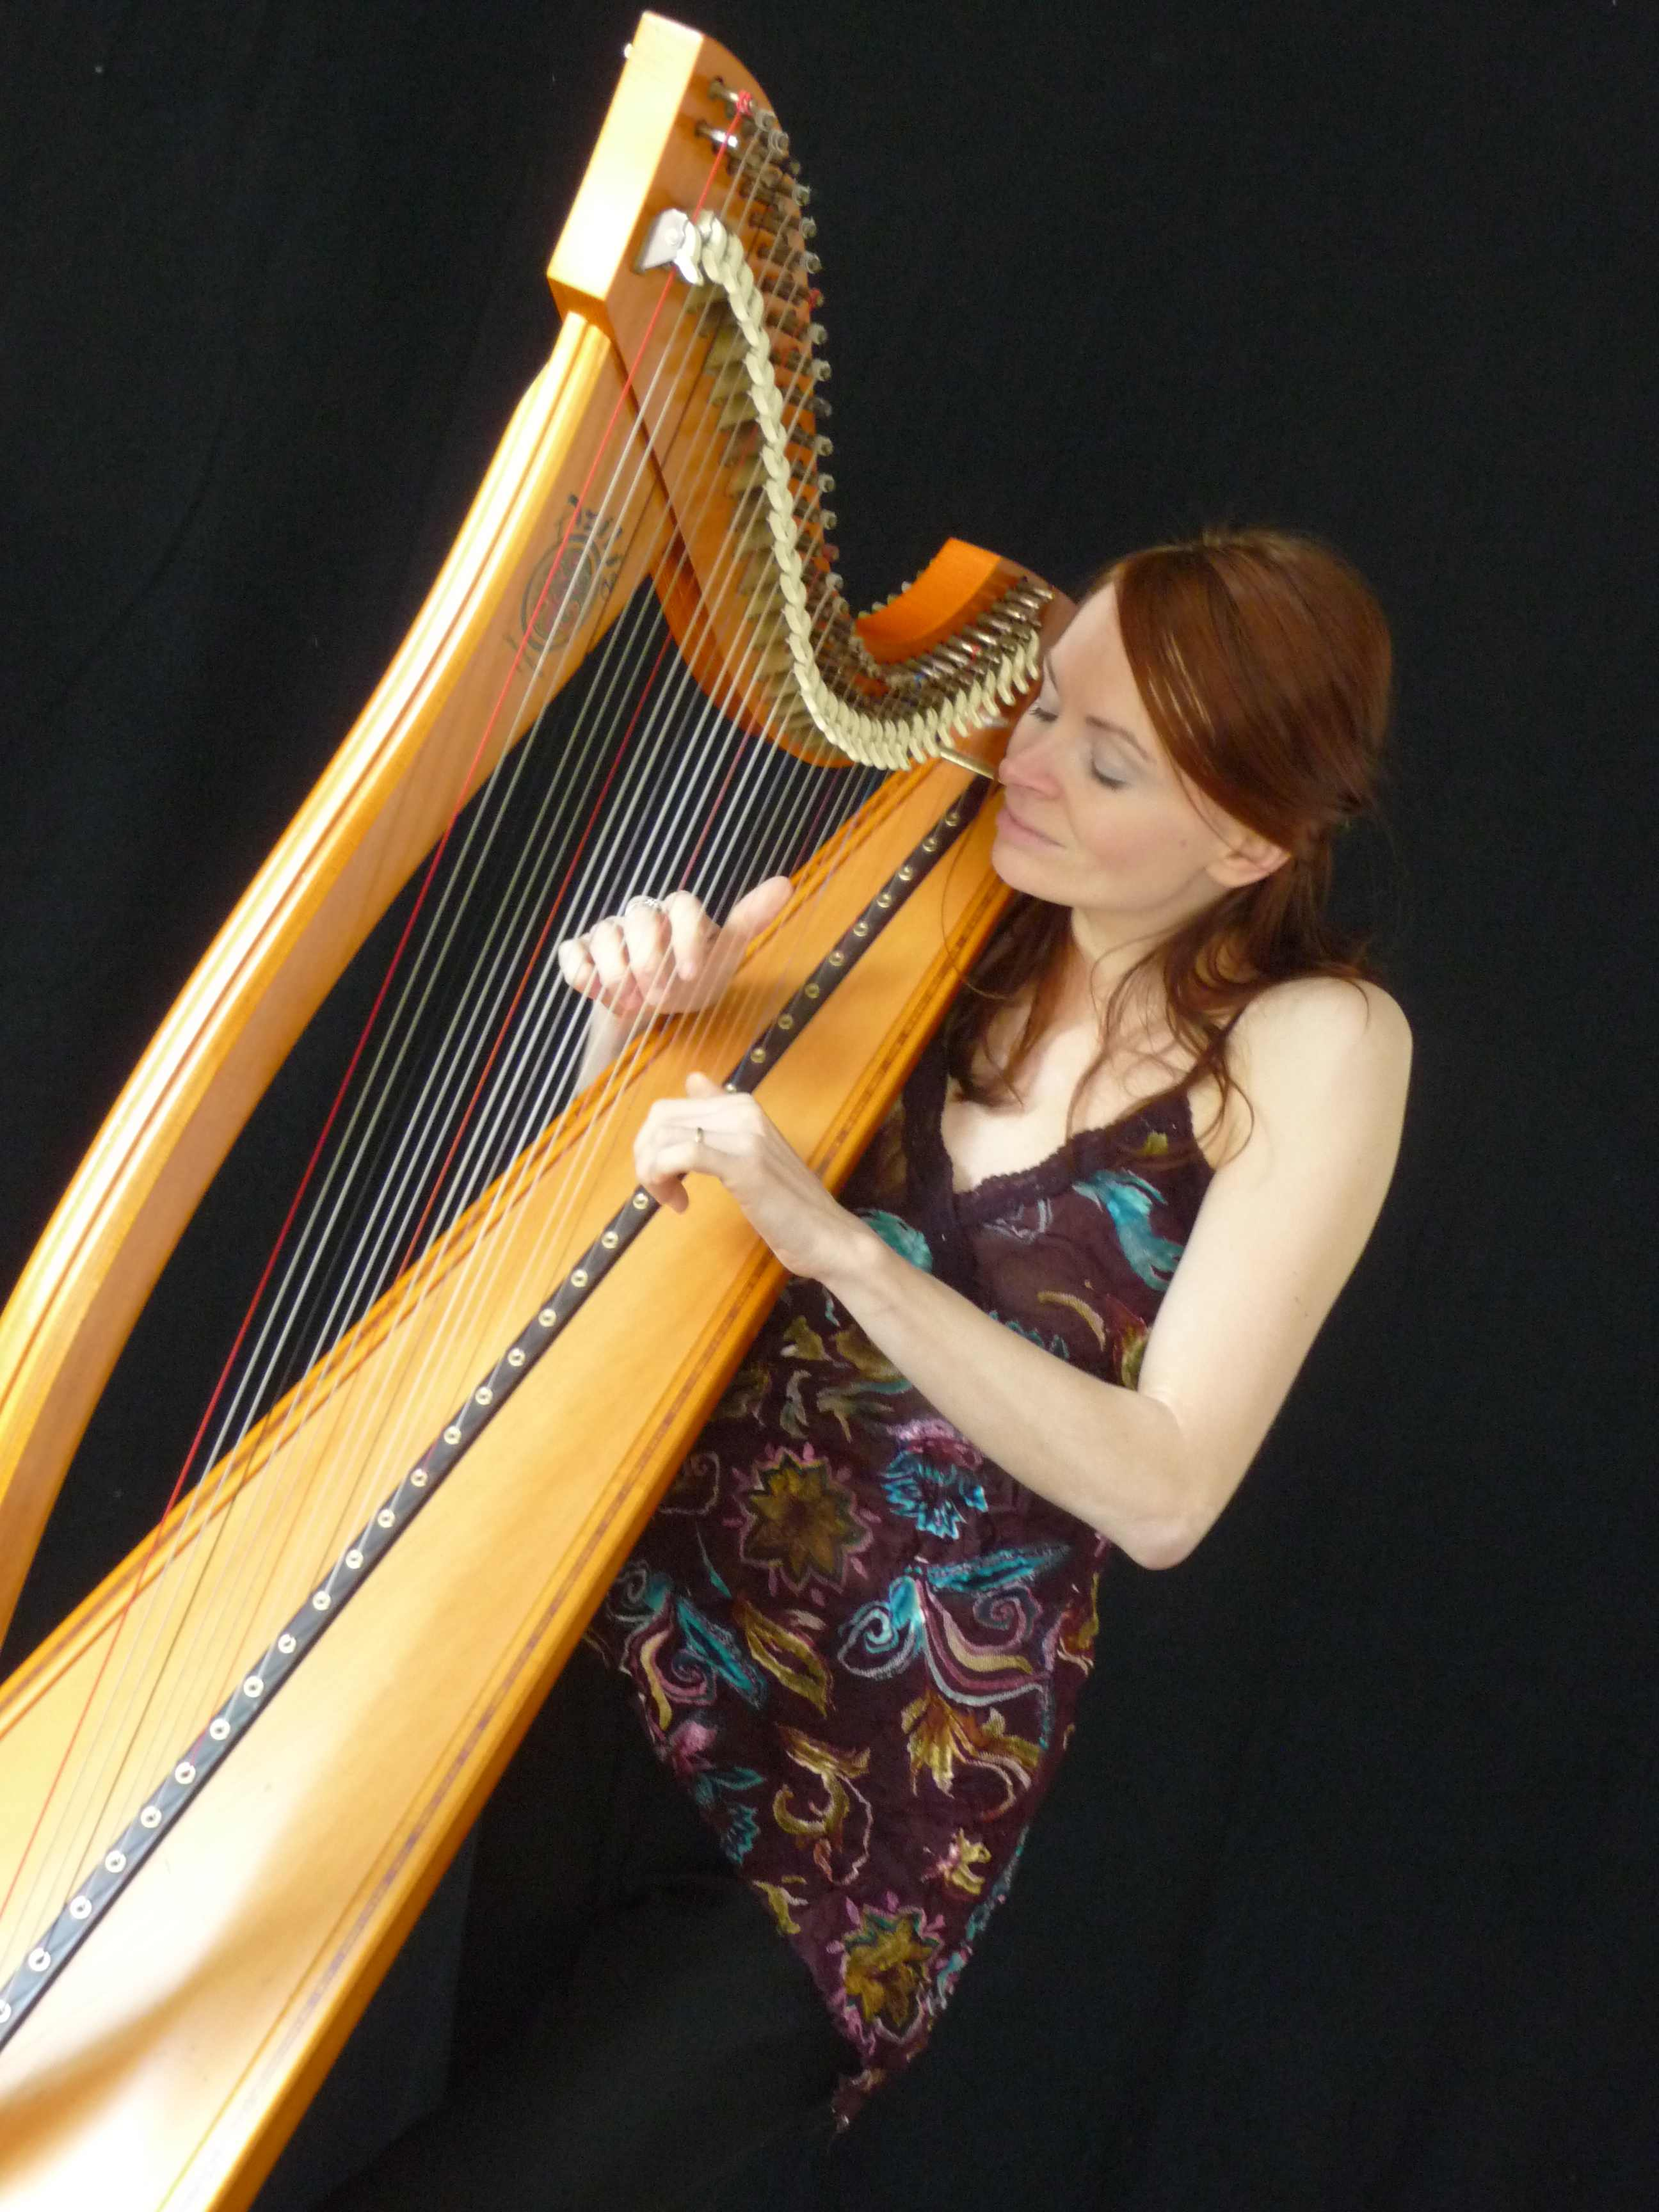 Gwenael Kerleo harpiste. Concert du 25 août 2018